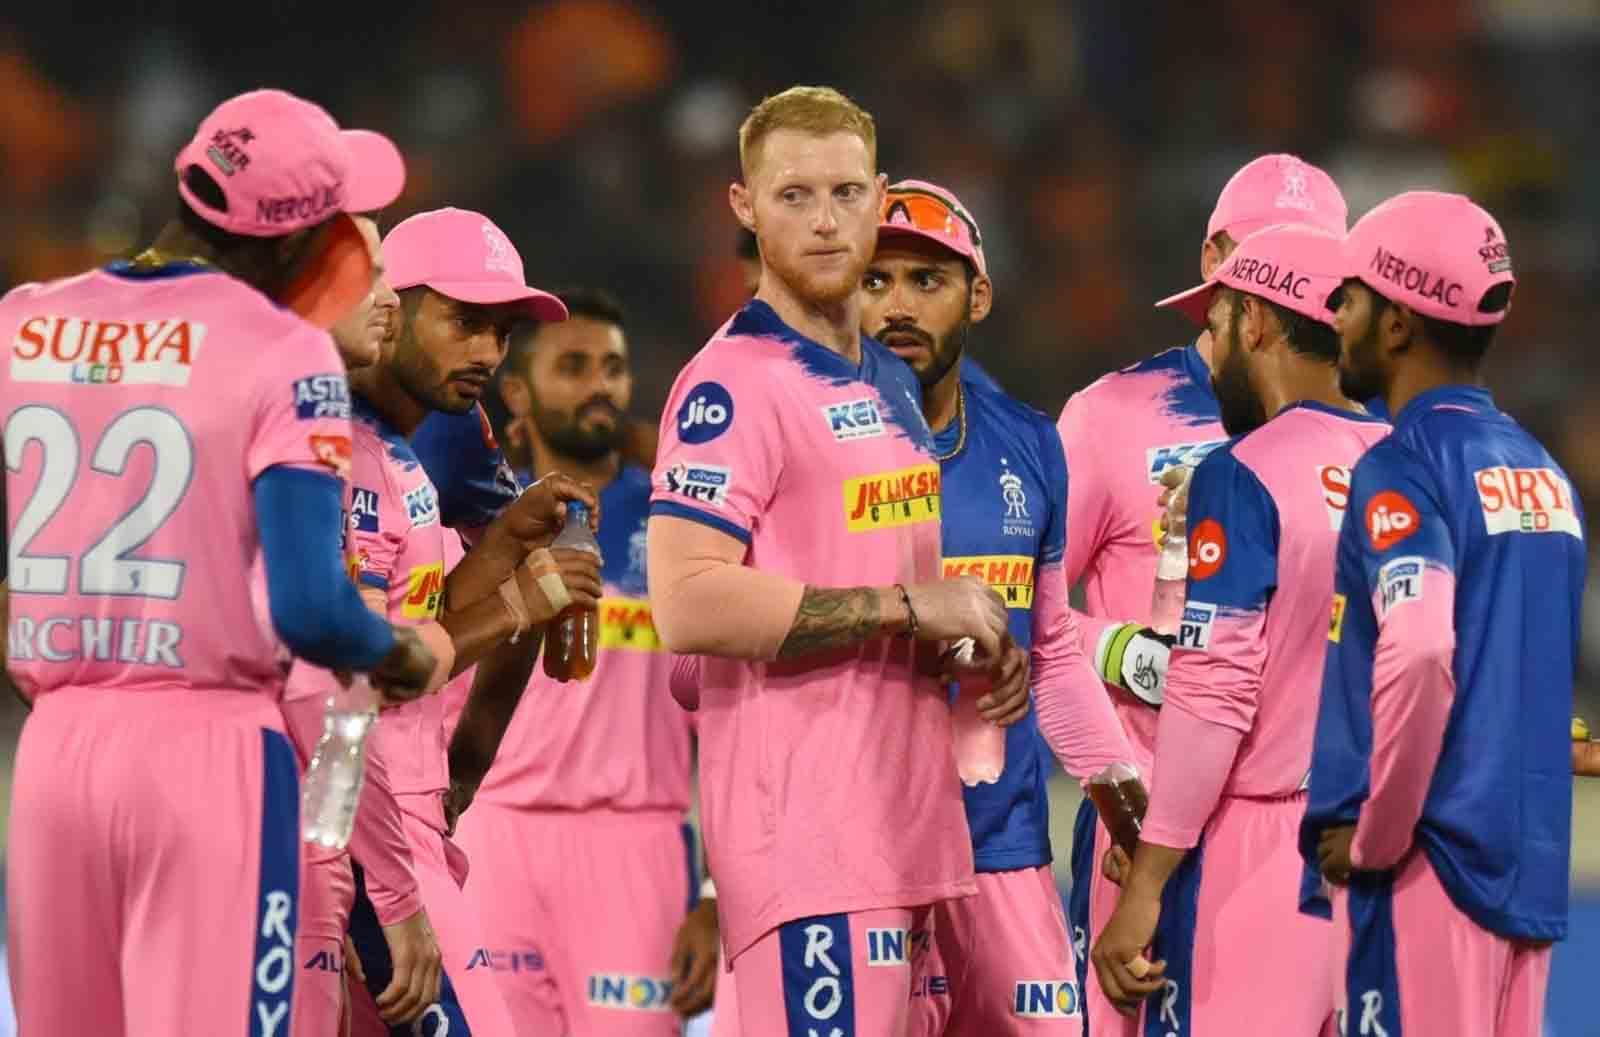 Rajasthan Royals team 2020 players list | RR Playing 11| IPL 2020 Player List